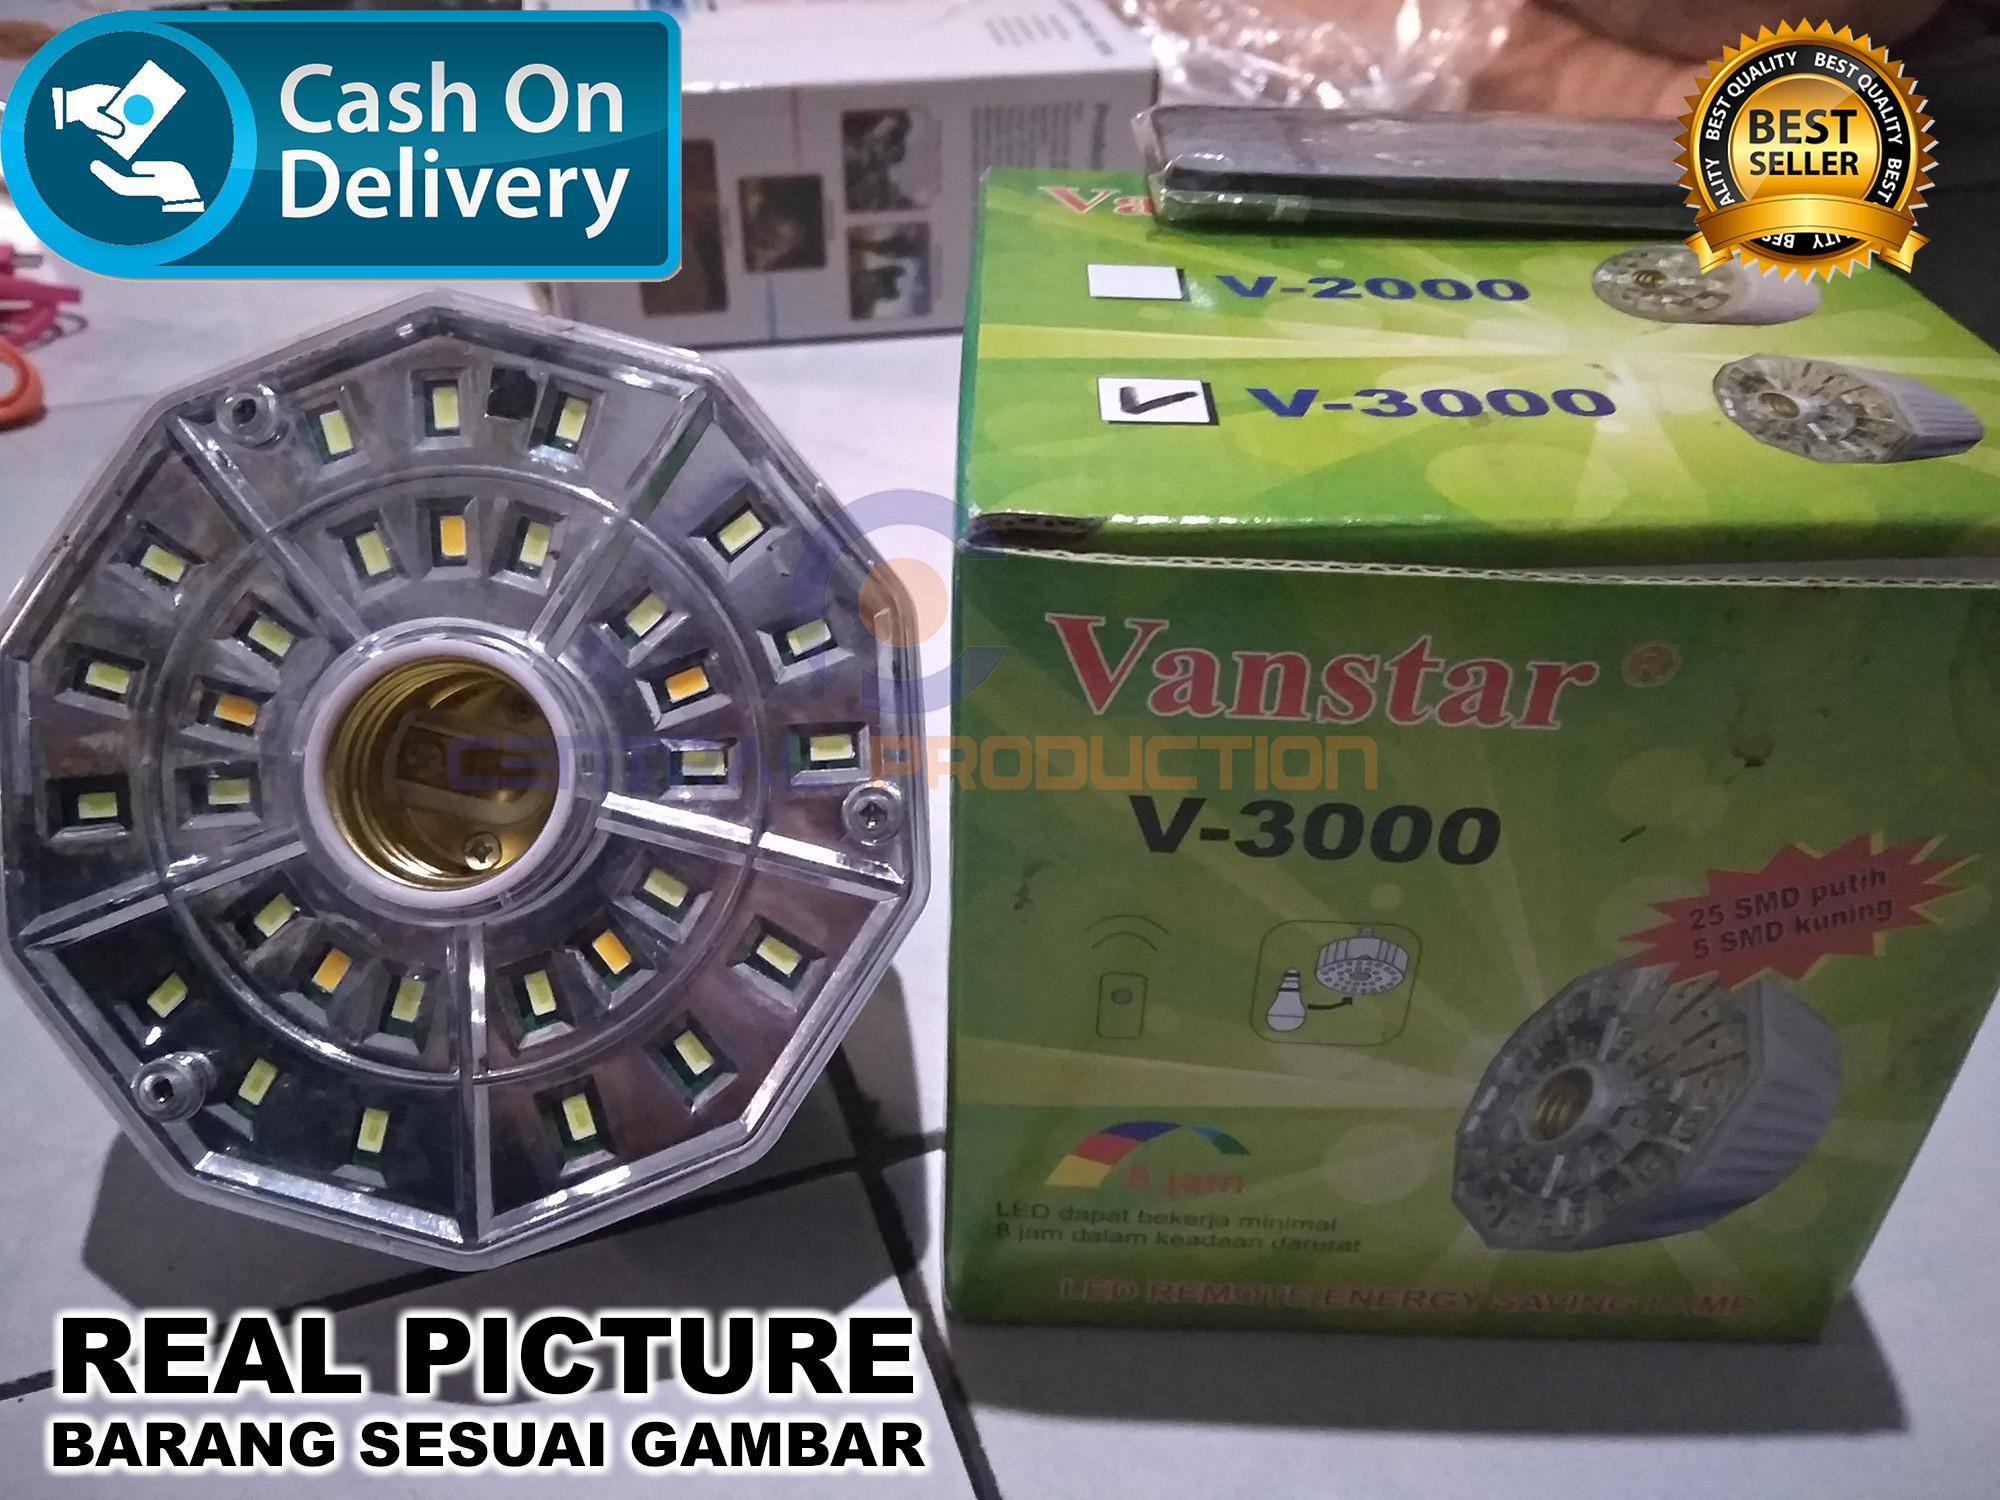 Lampu Remote Emergency V3000 VANSTAR/Lampu Darurat REAL PICTURE